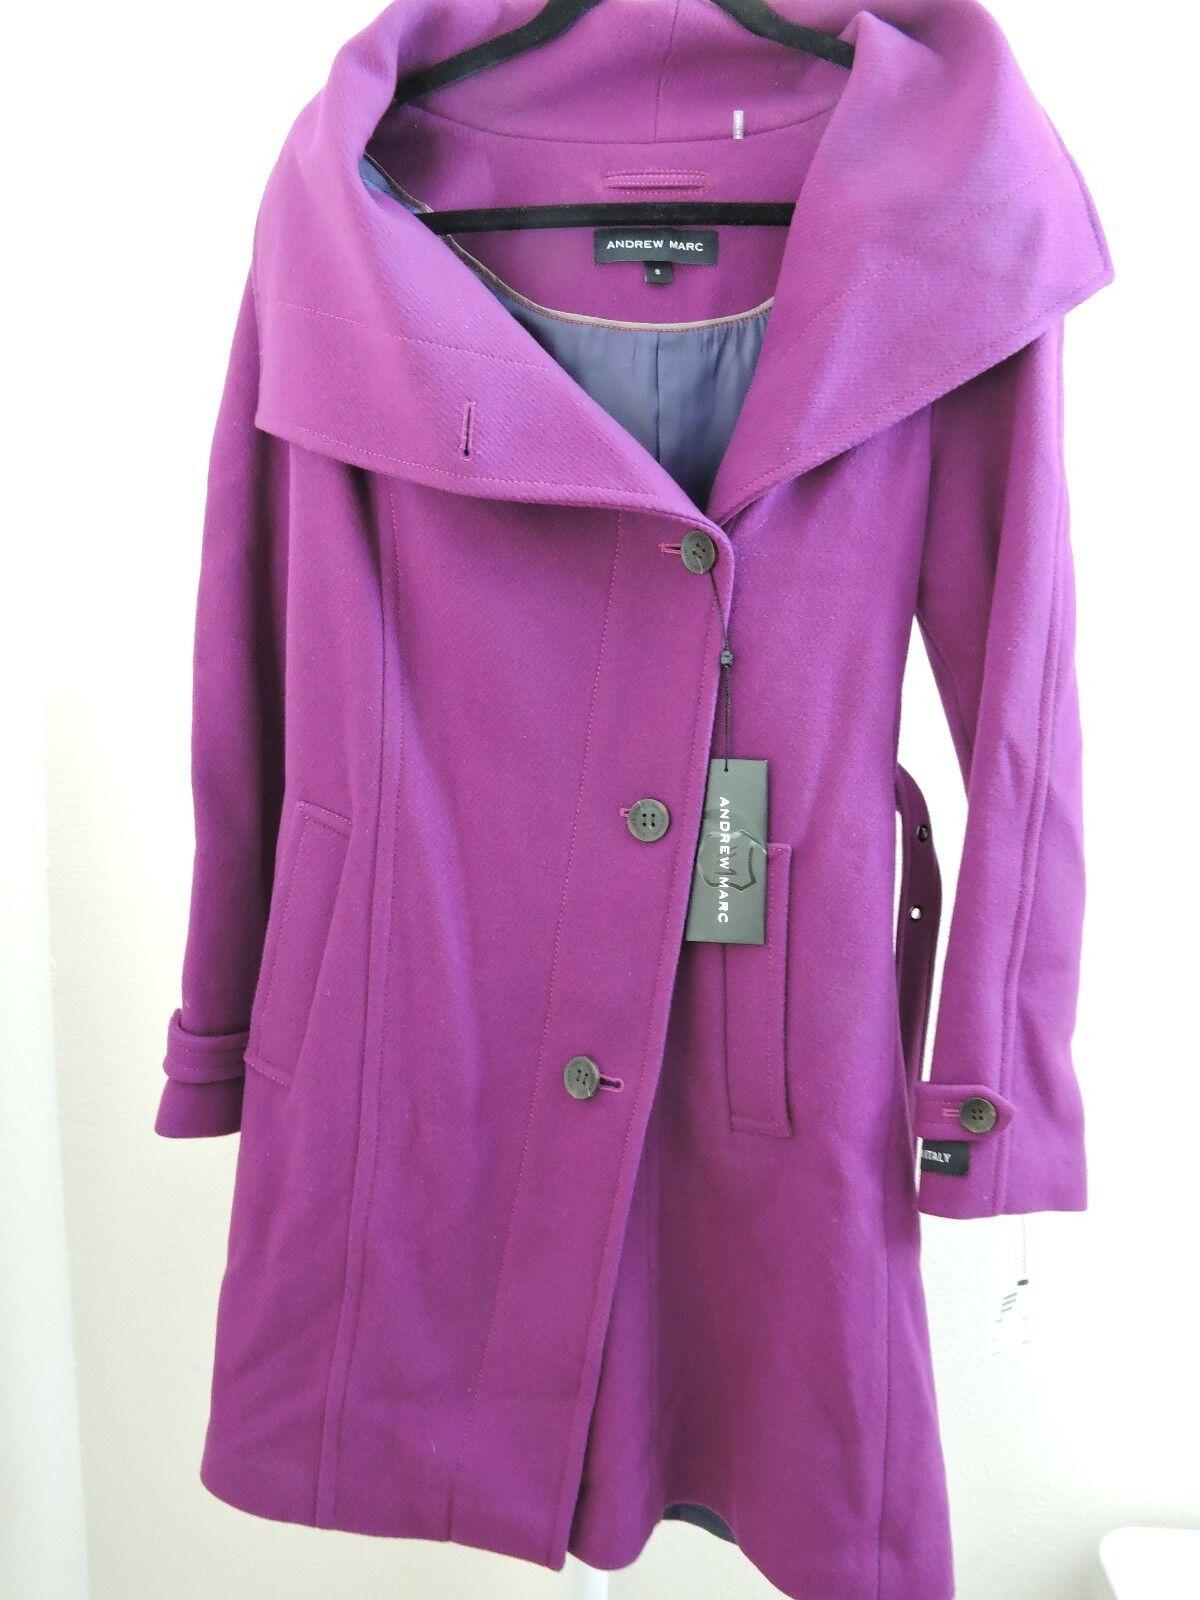 Andrew Marc Italian Virgin Wool Lined Lavender Belted Dress Coat Size - 8